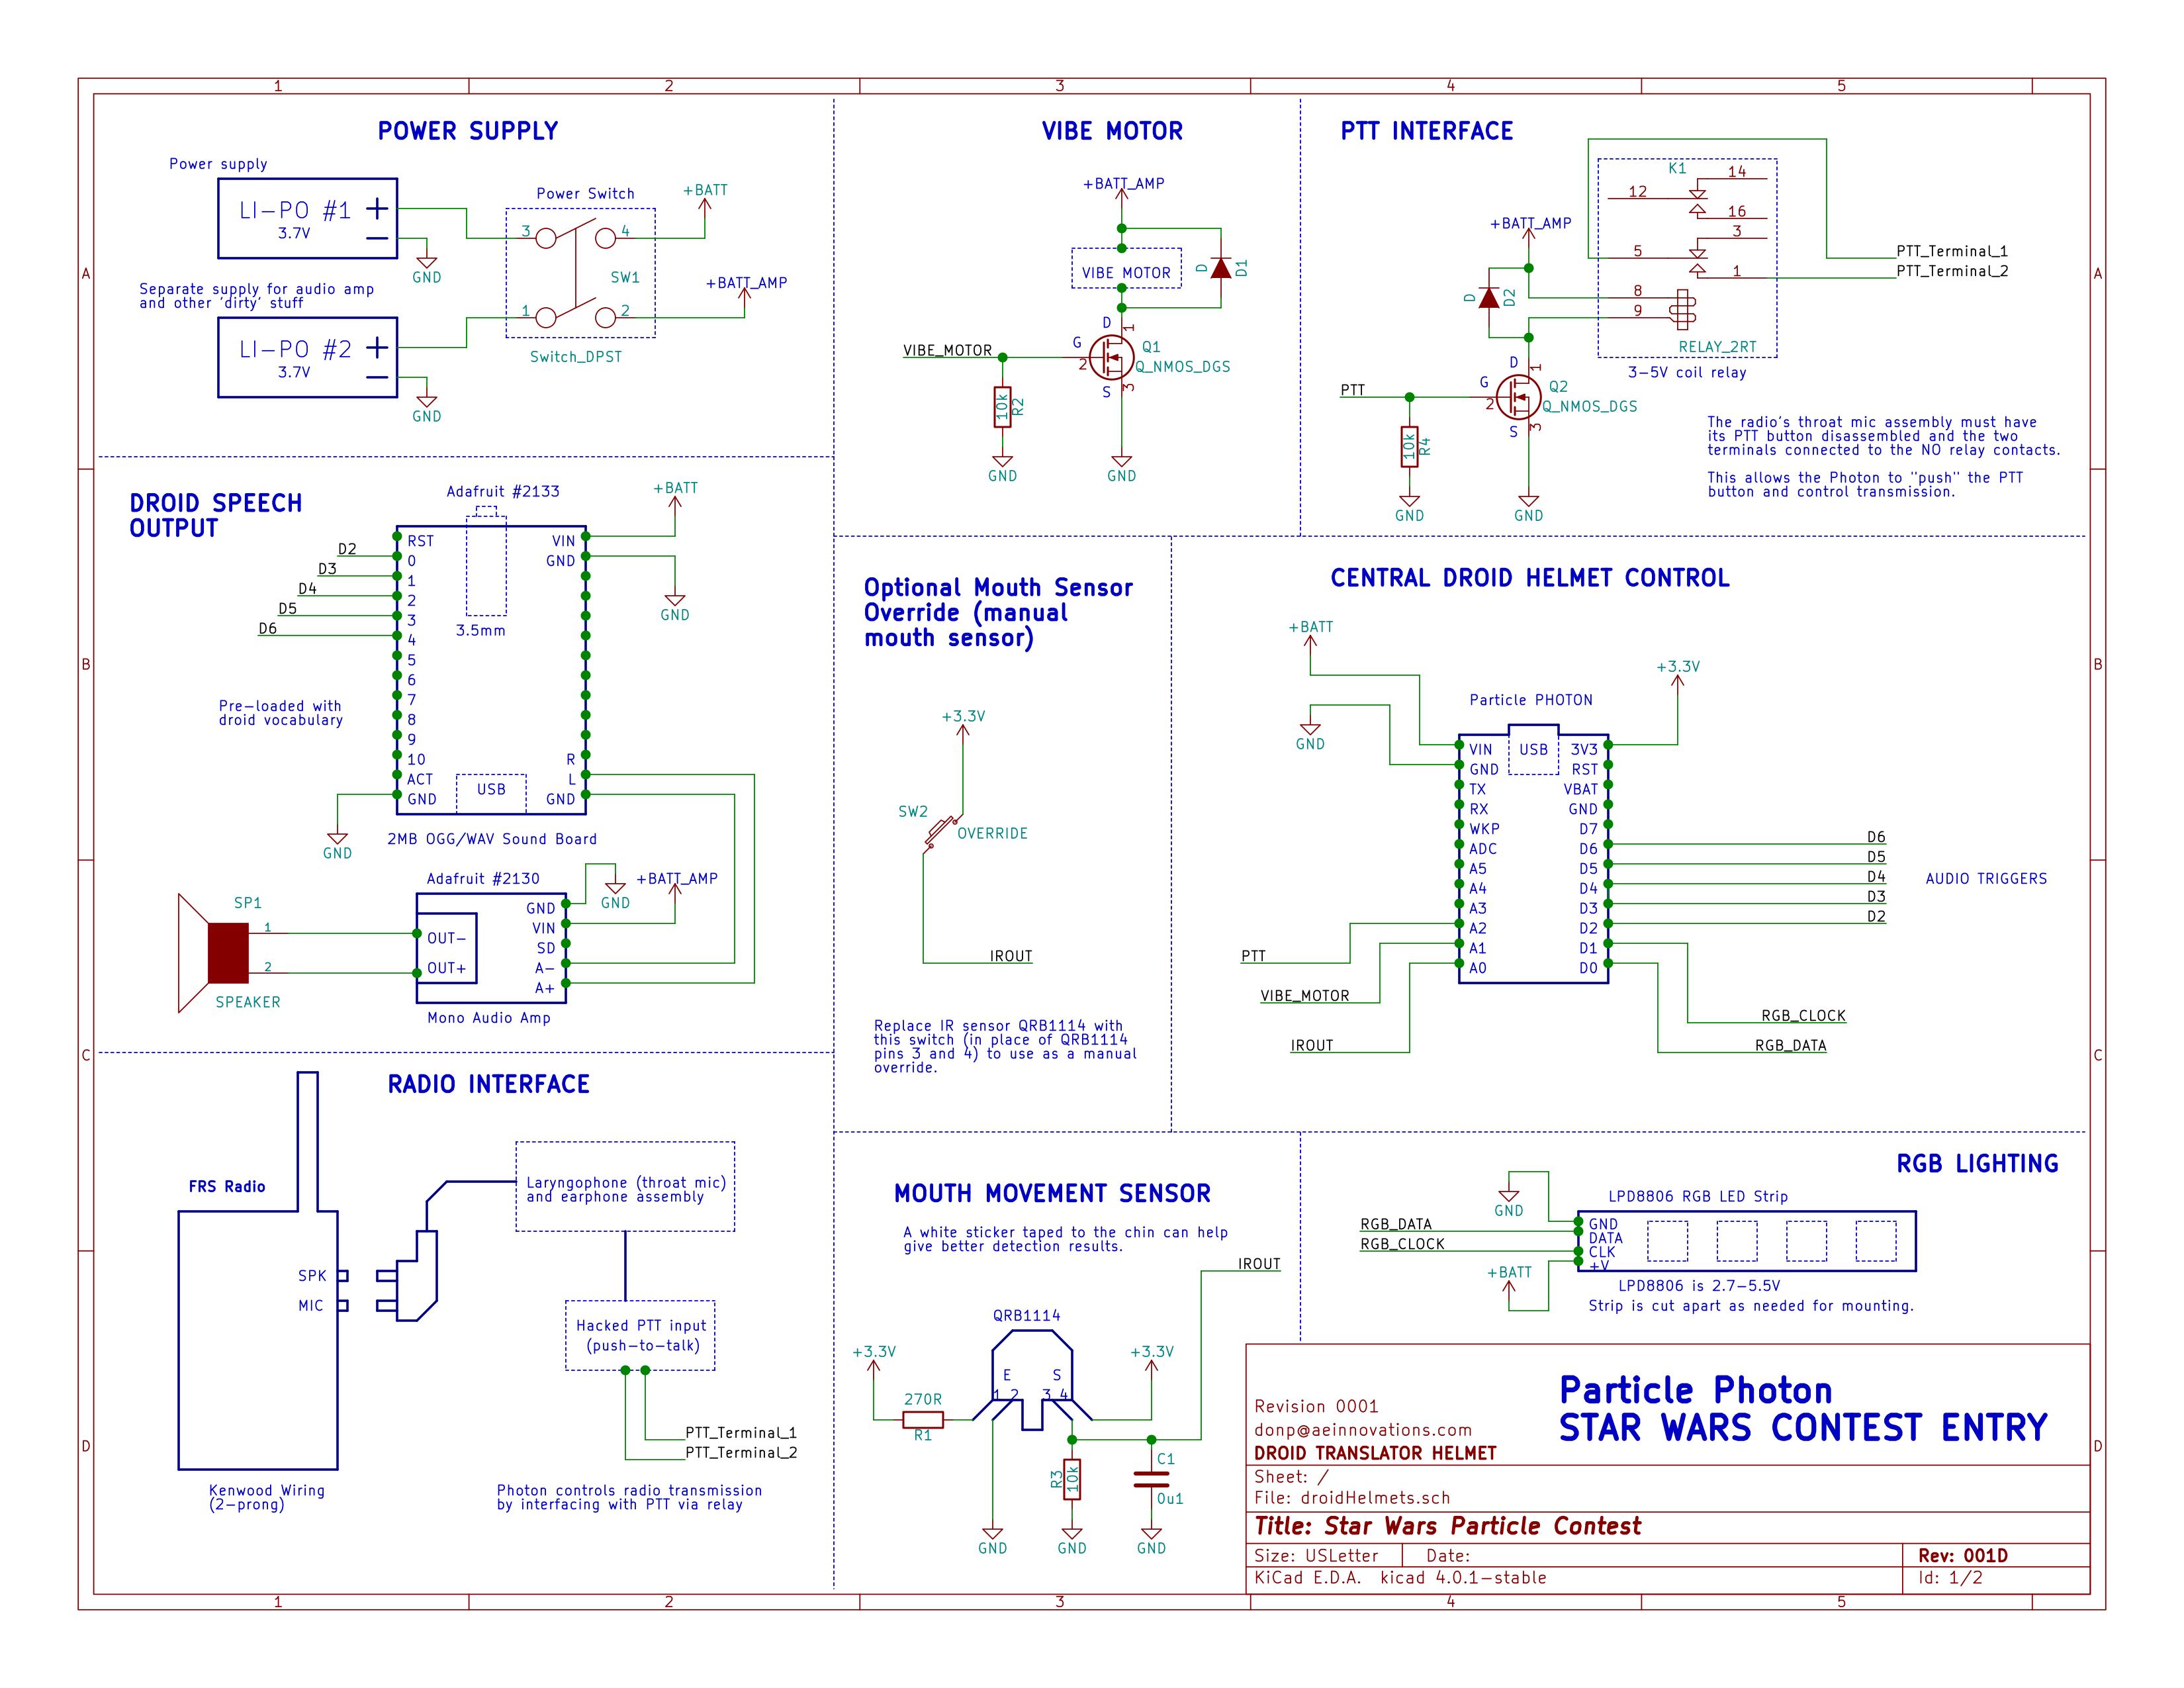 main schematic for one helmet